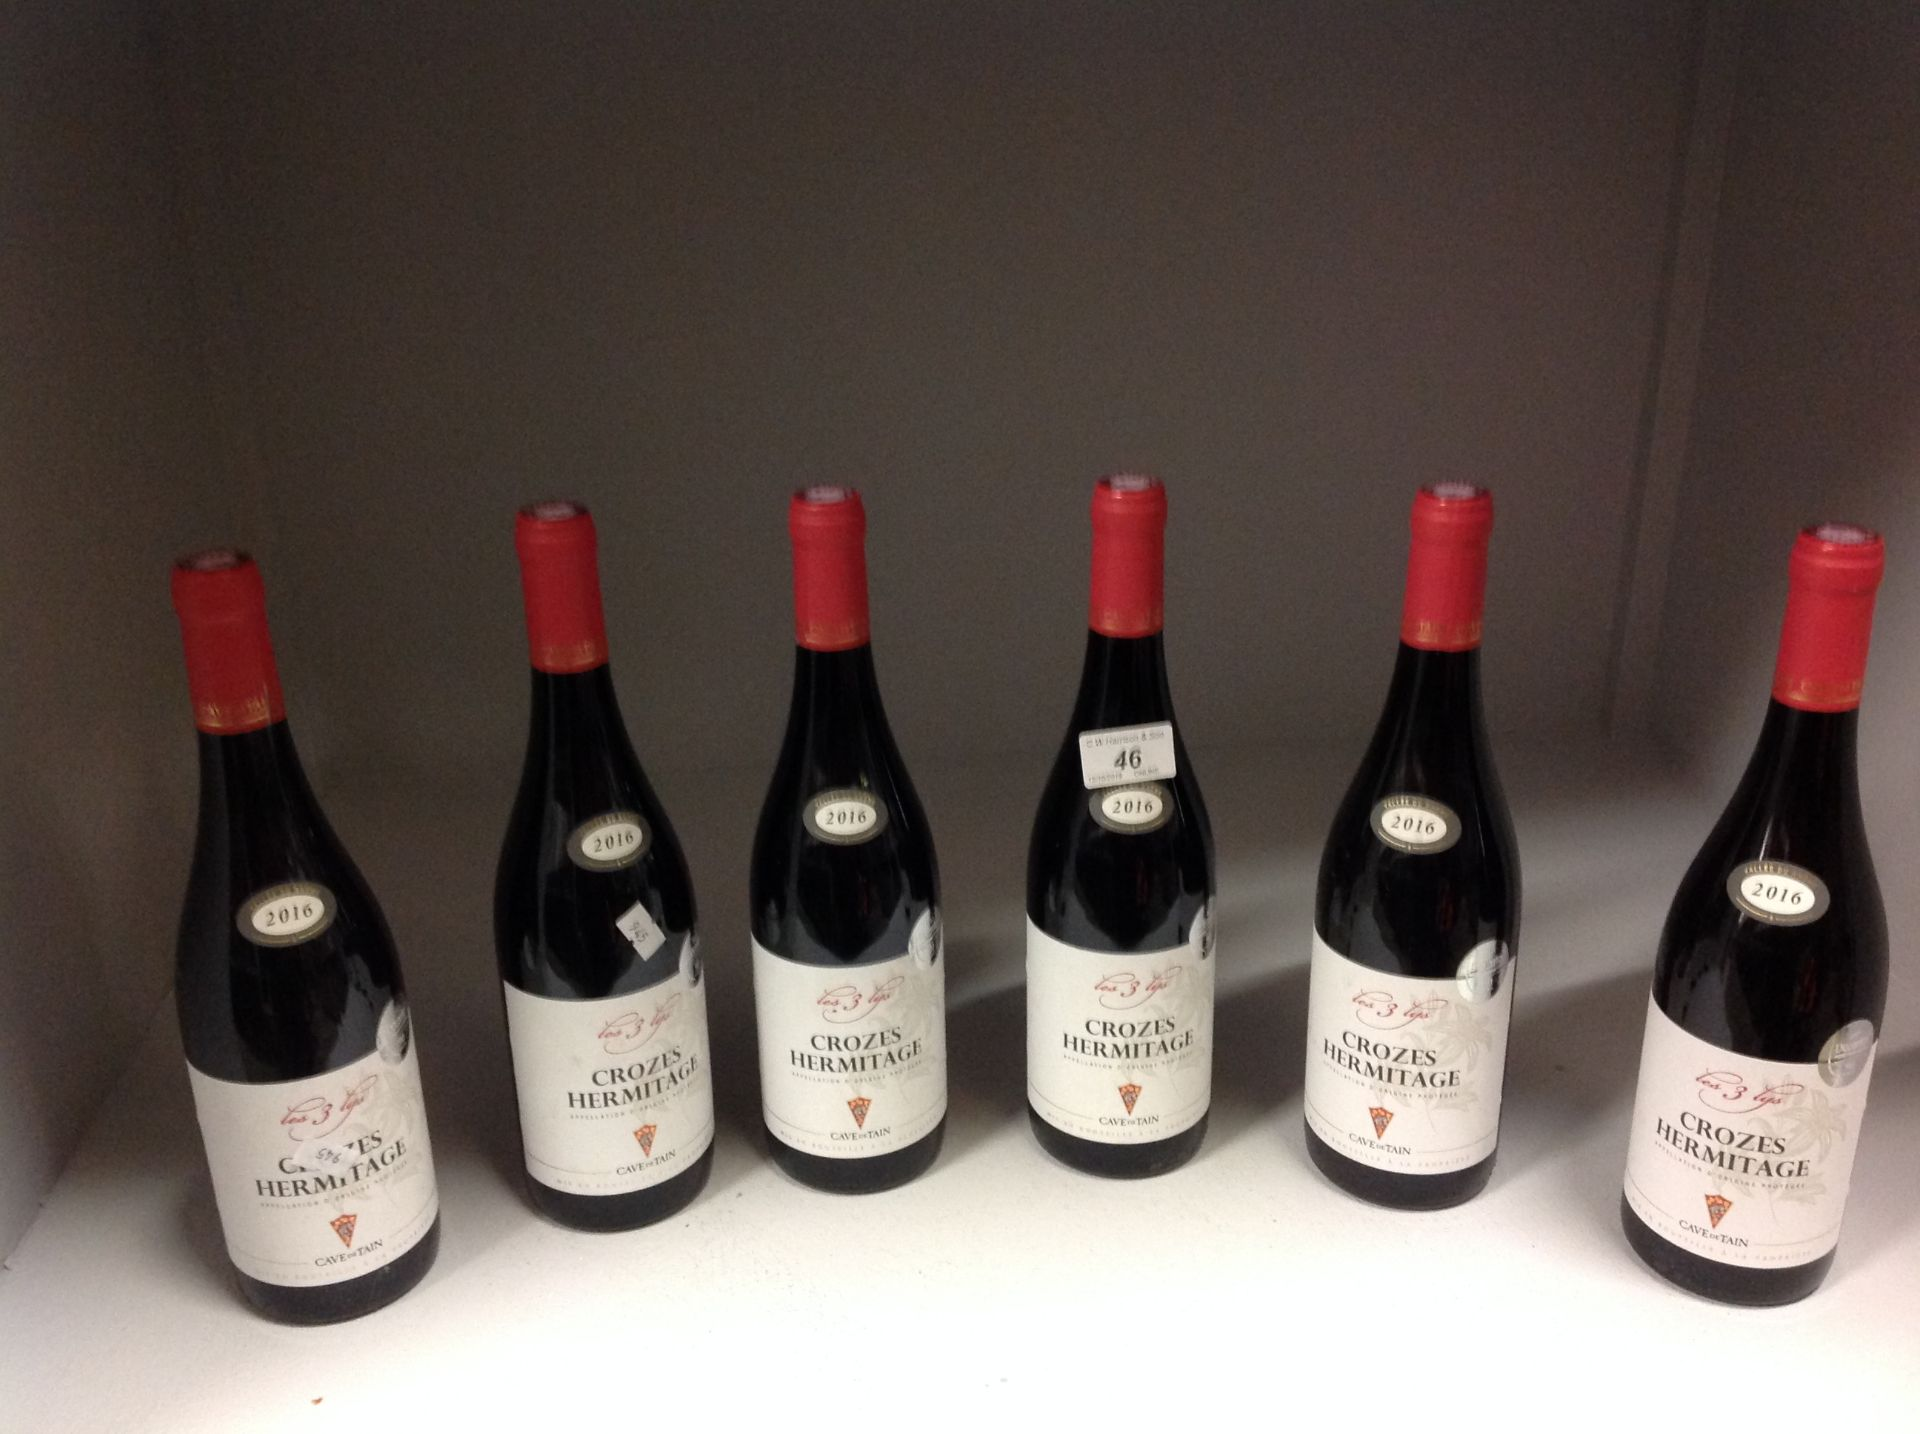 Lot 46 - 6 x 750ml bottles Crozes Hermitage - 201